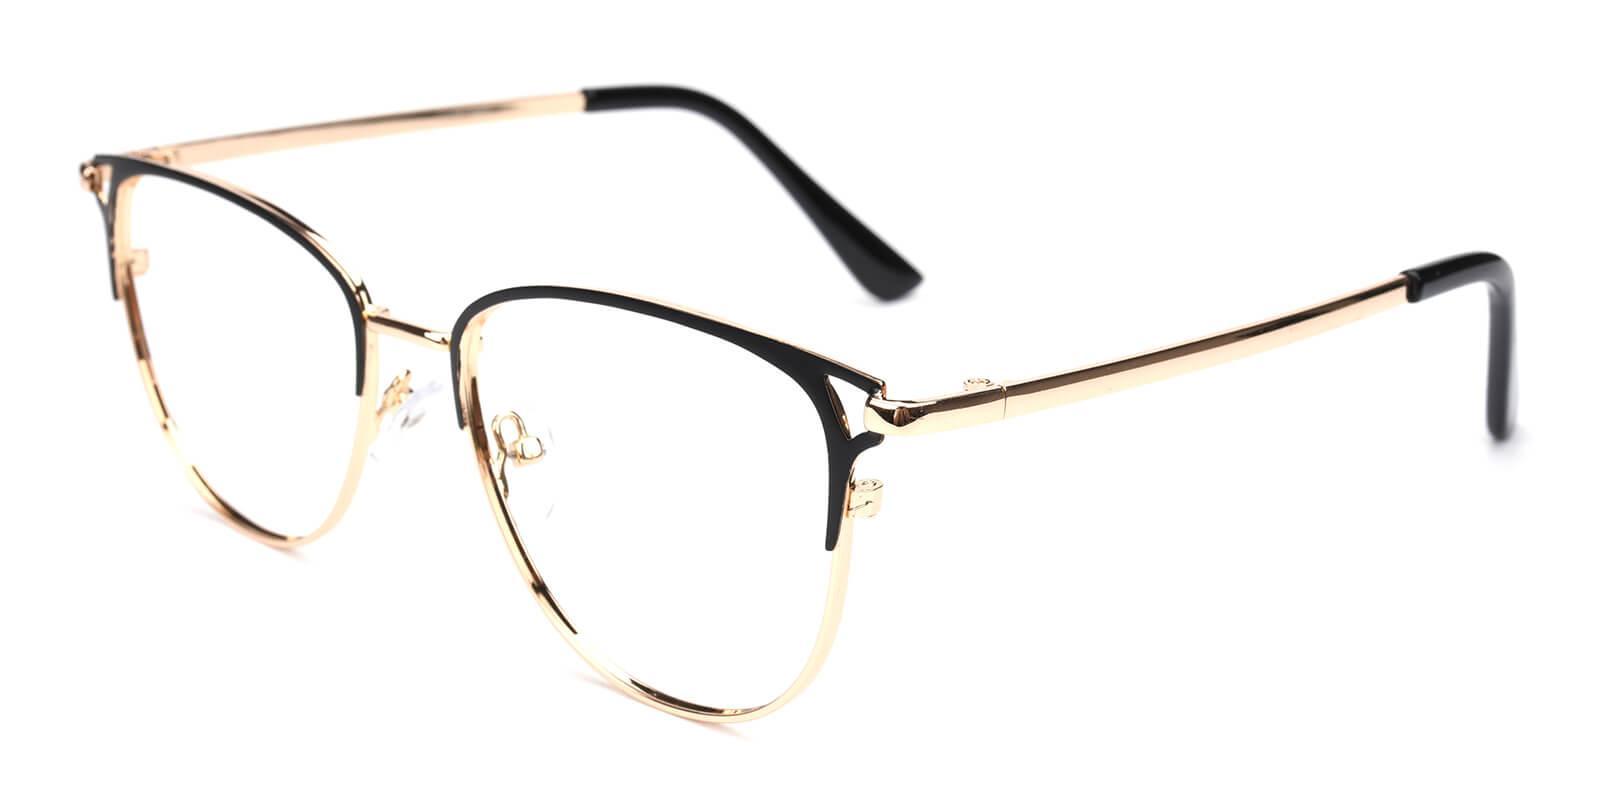 Geraldine-Black-Browline-Metal-Eyeglasses-additional1